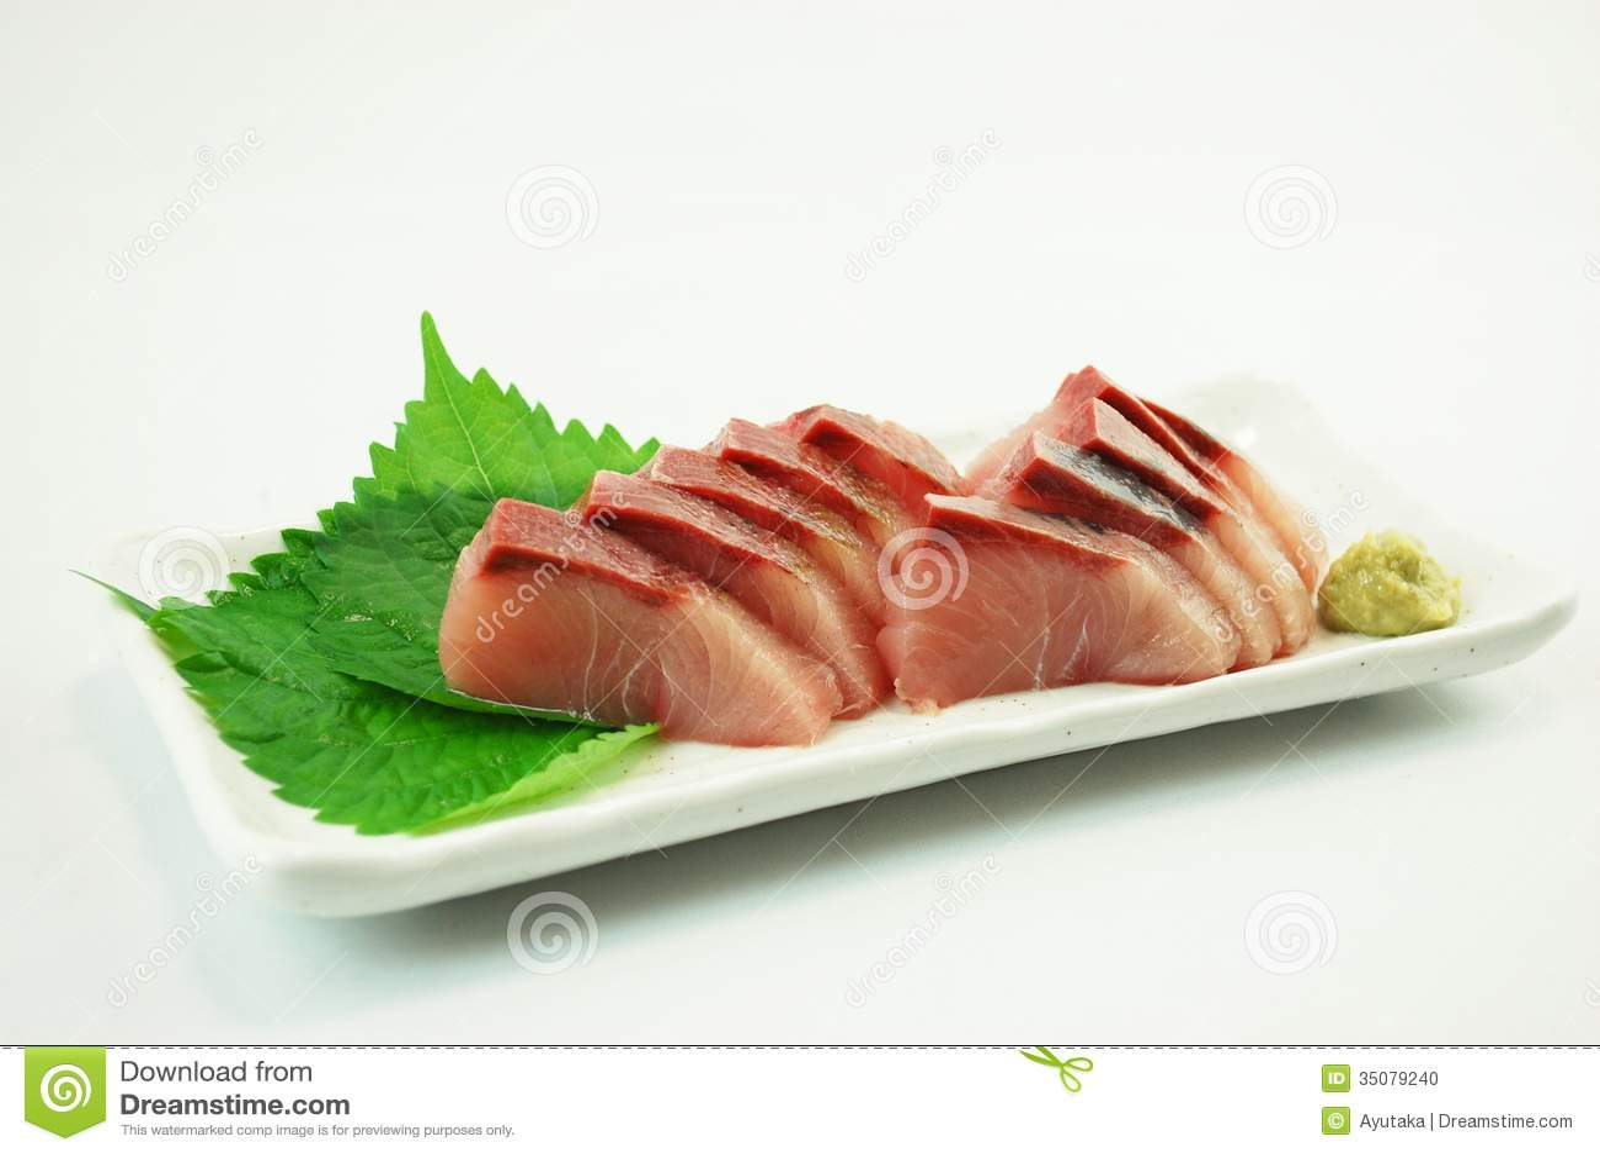 yellowtail sashimi and mango puree - 640×425